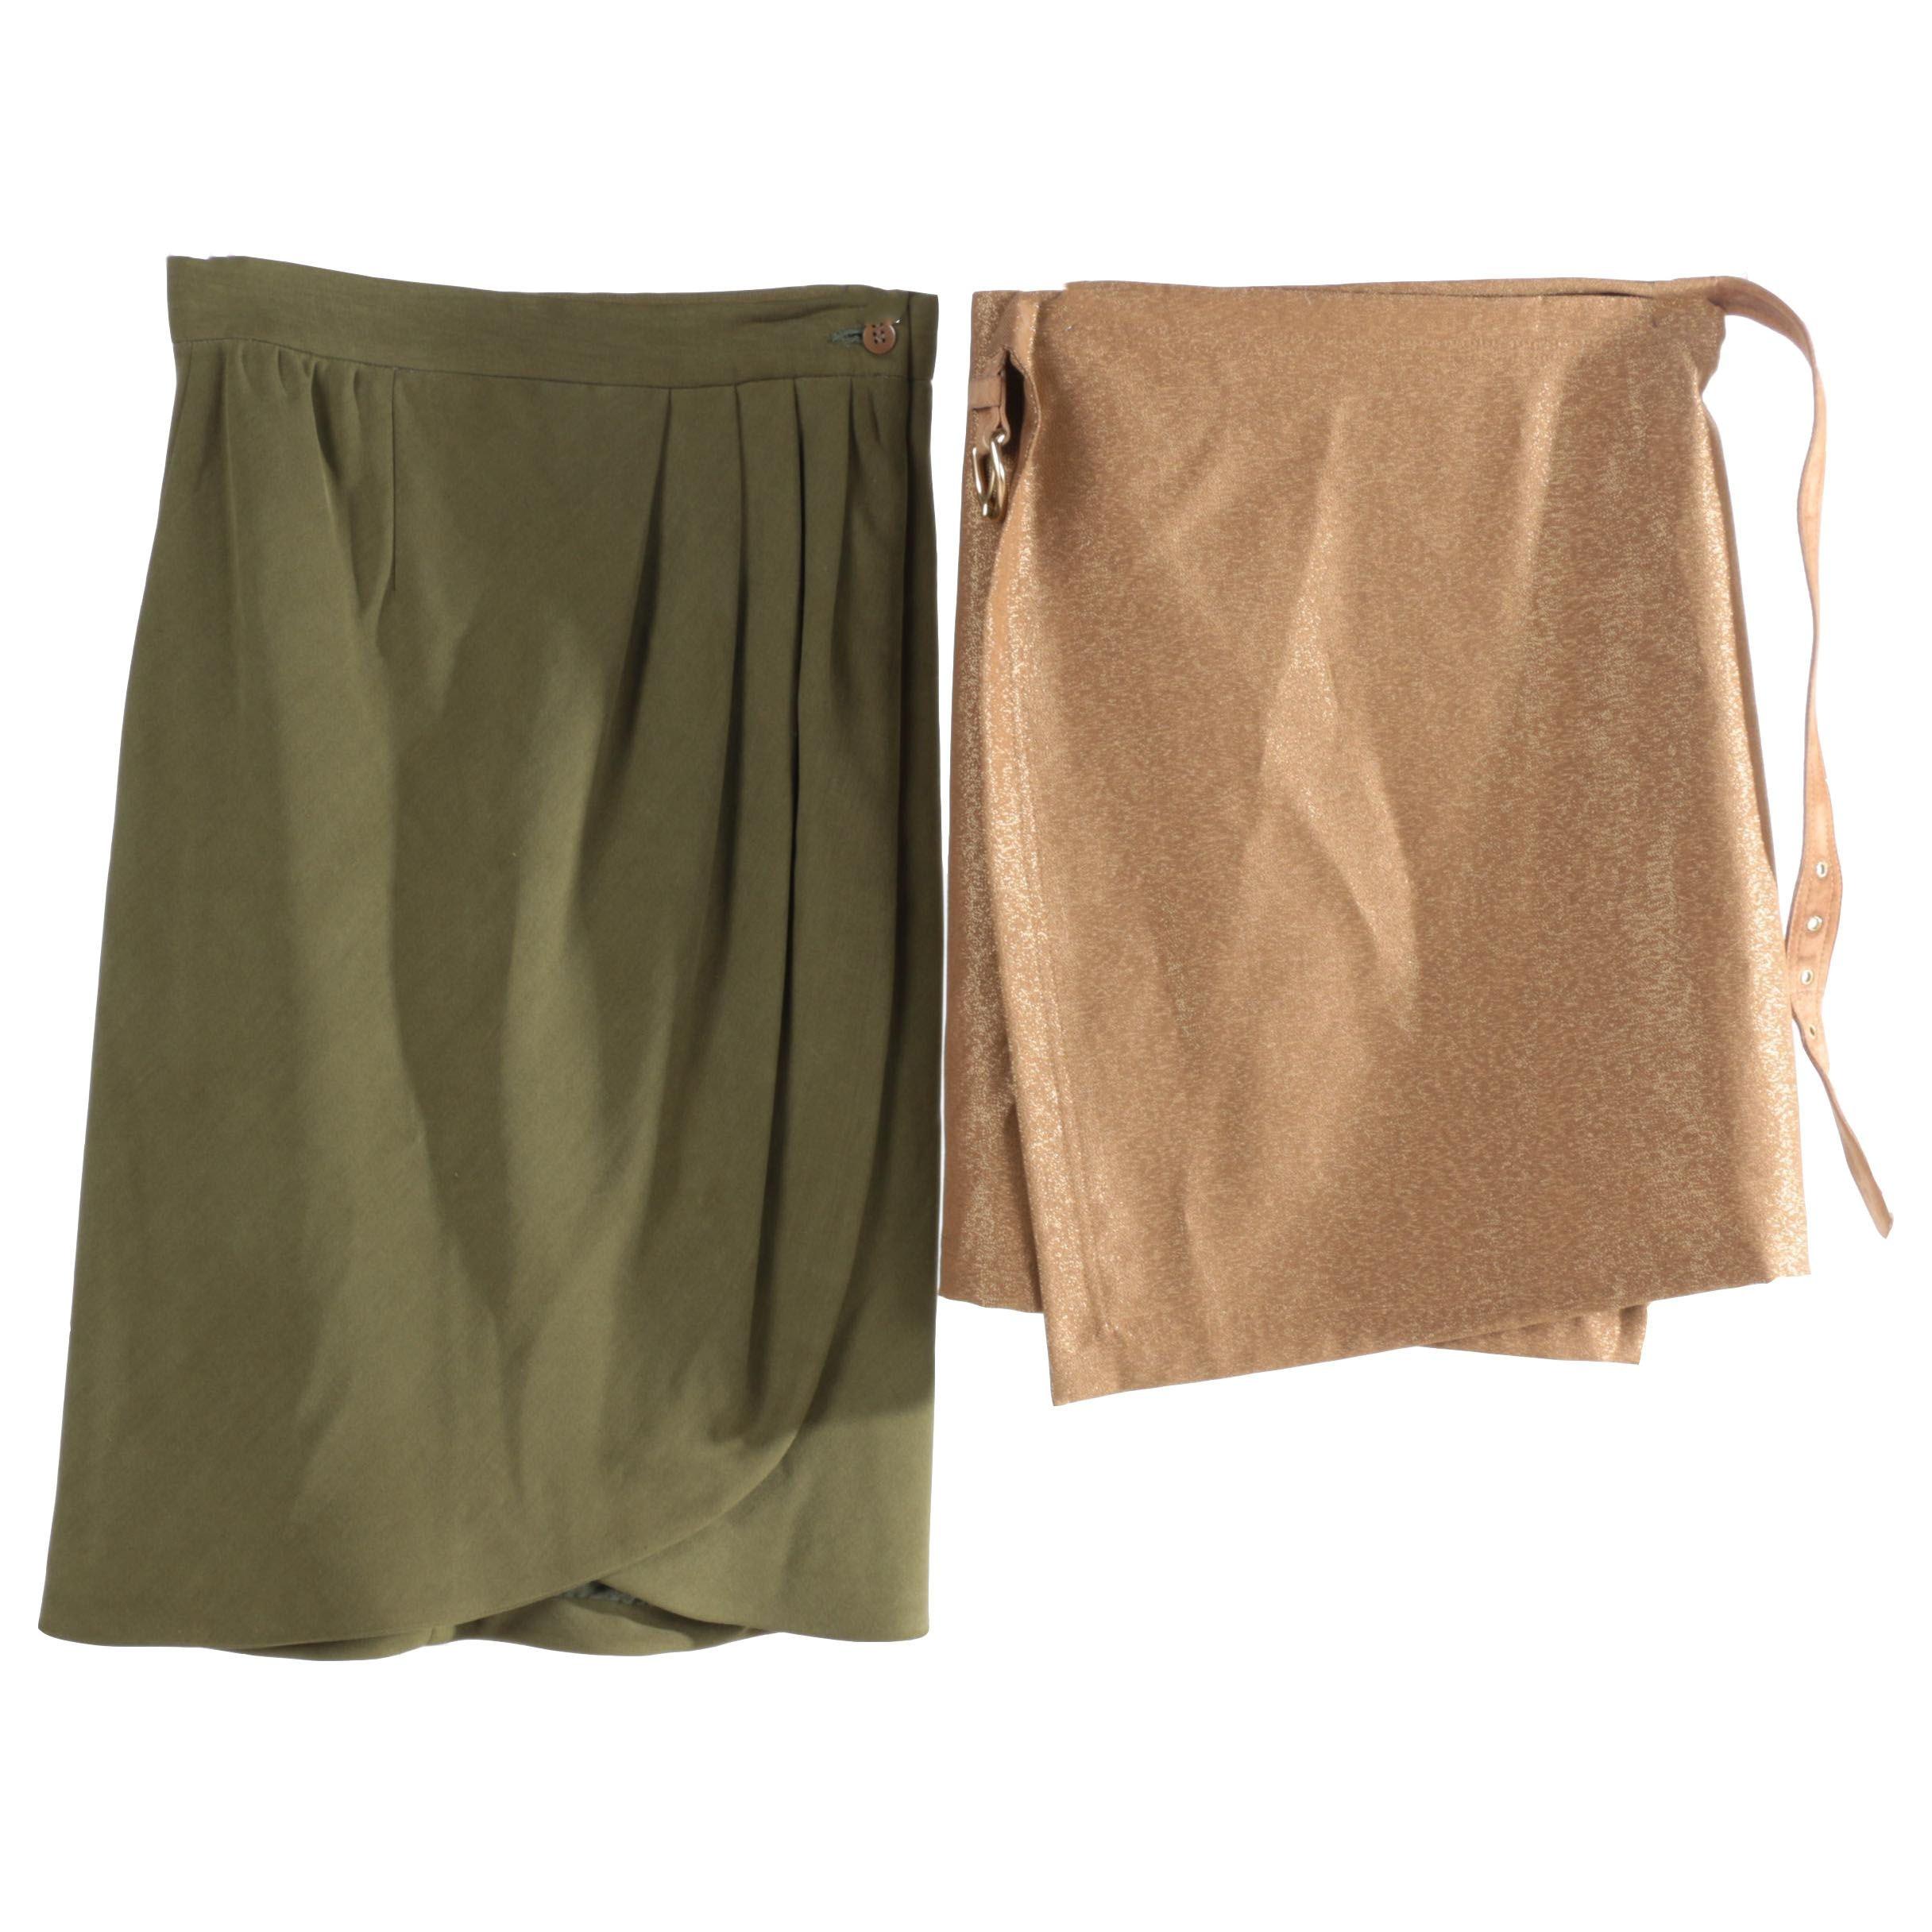 Women's Giorgio Armani and Isaac Mizrahi Wrap Skirts